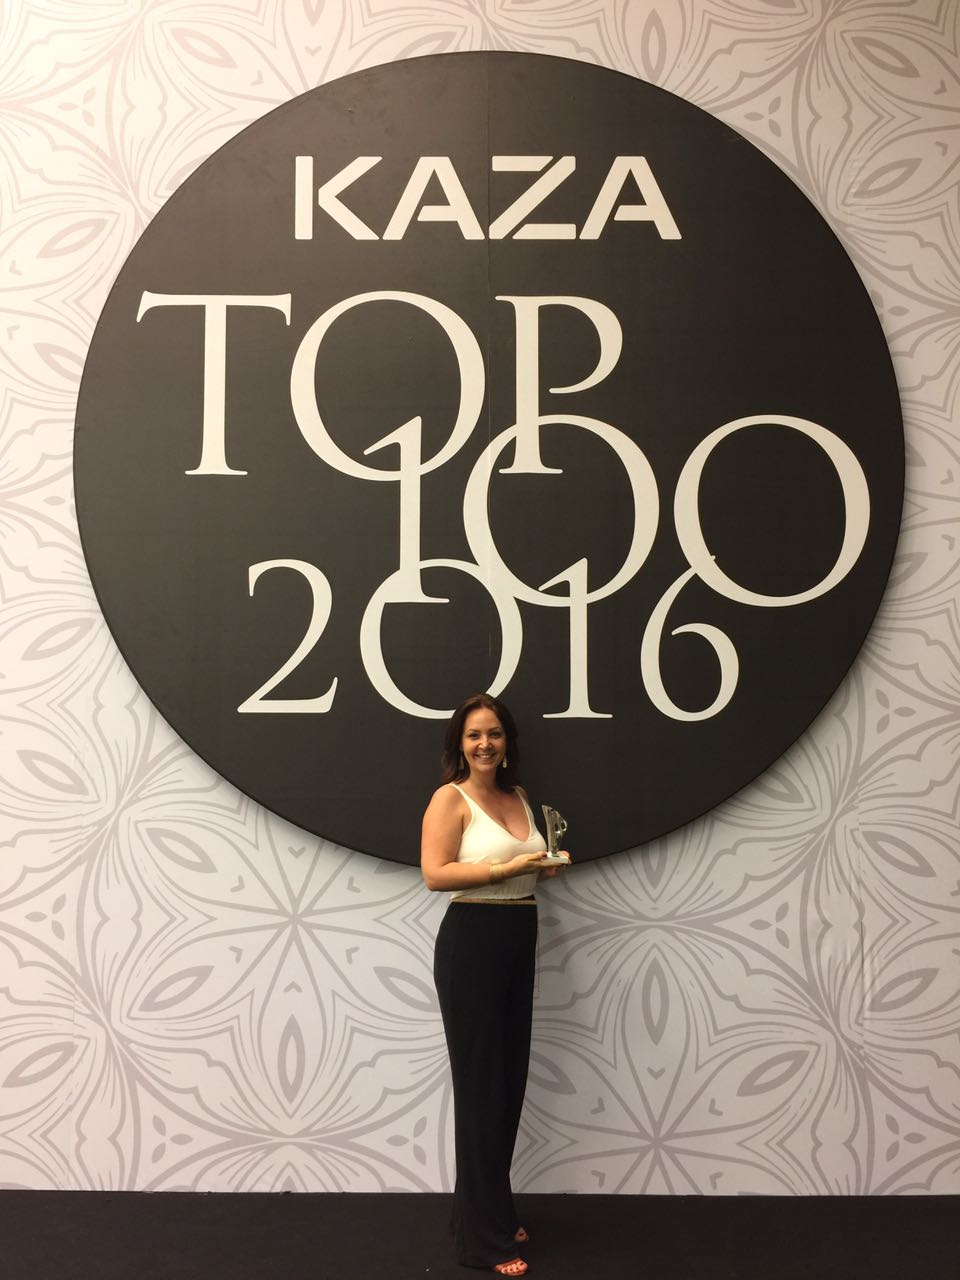 Premiação Top 100 Kaza